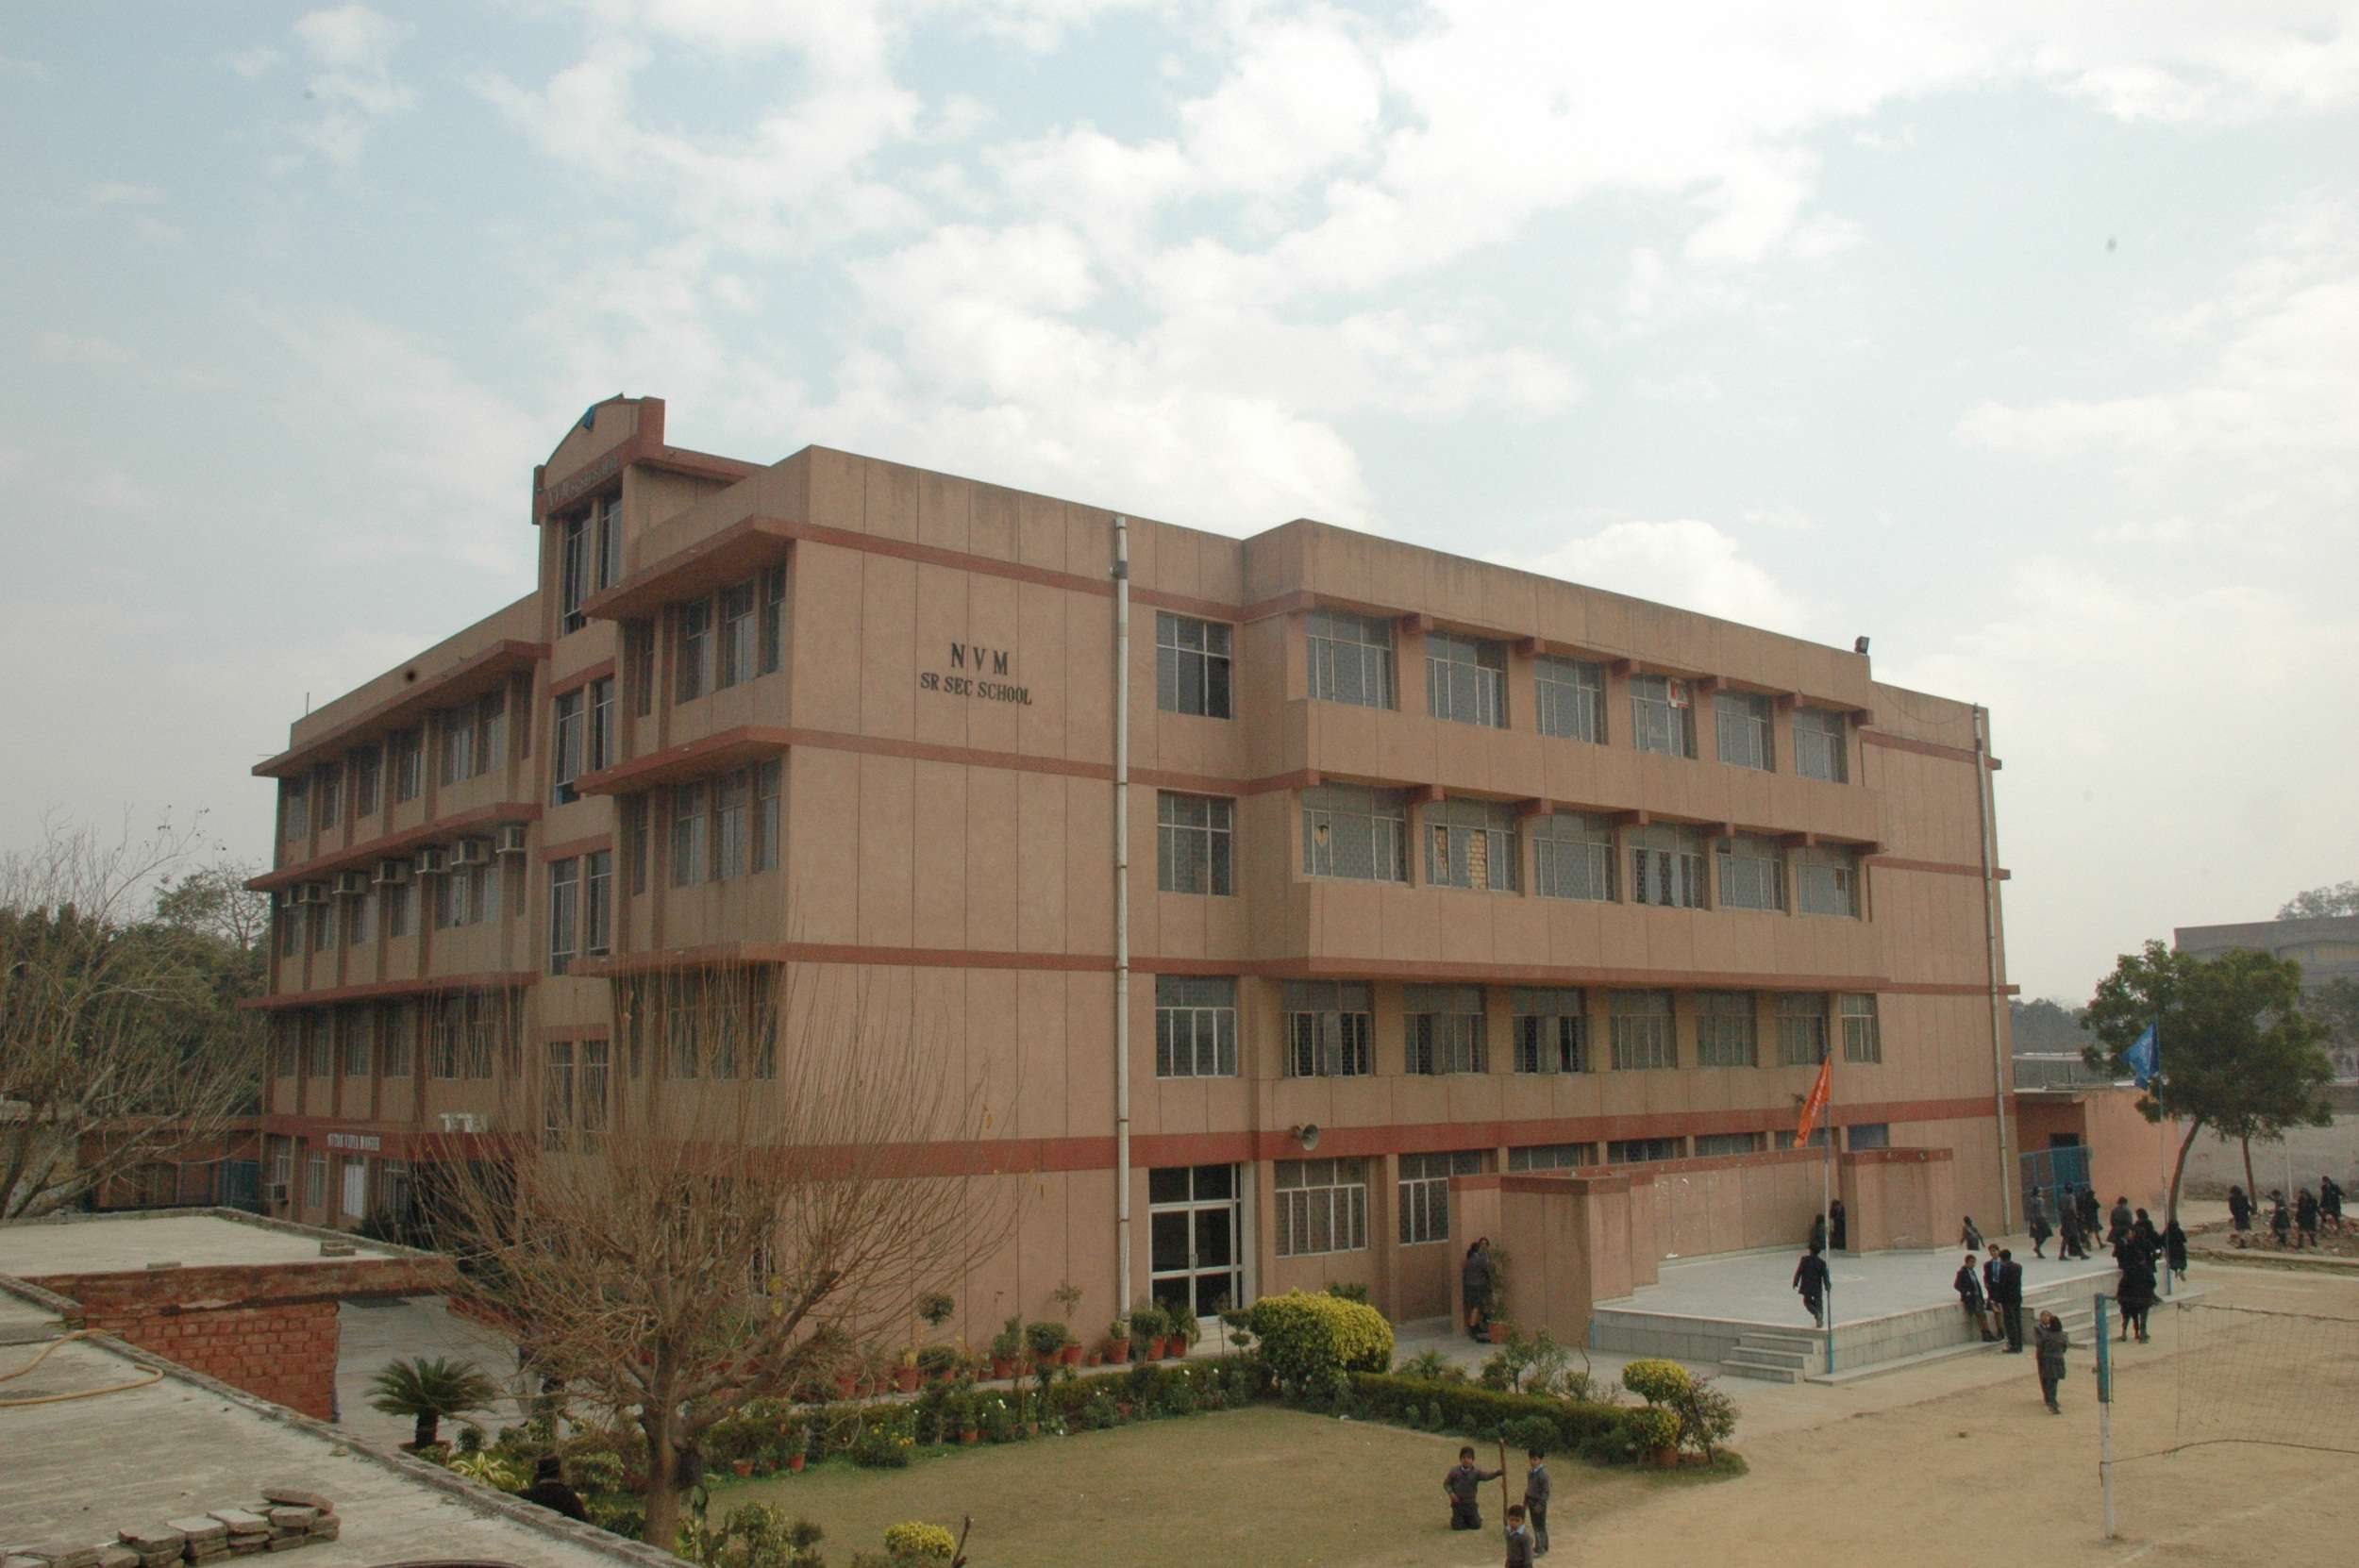 NUTAN VIDYA MANDIR SR SEC SCHOOL G T B ENCLAVE NAND NAGRI DILSHAD GARDEN DELHI 2730102